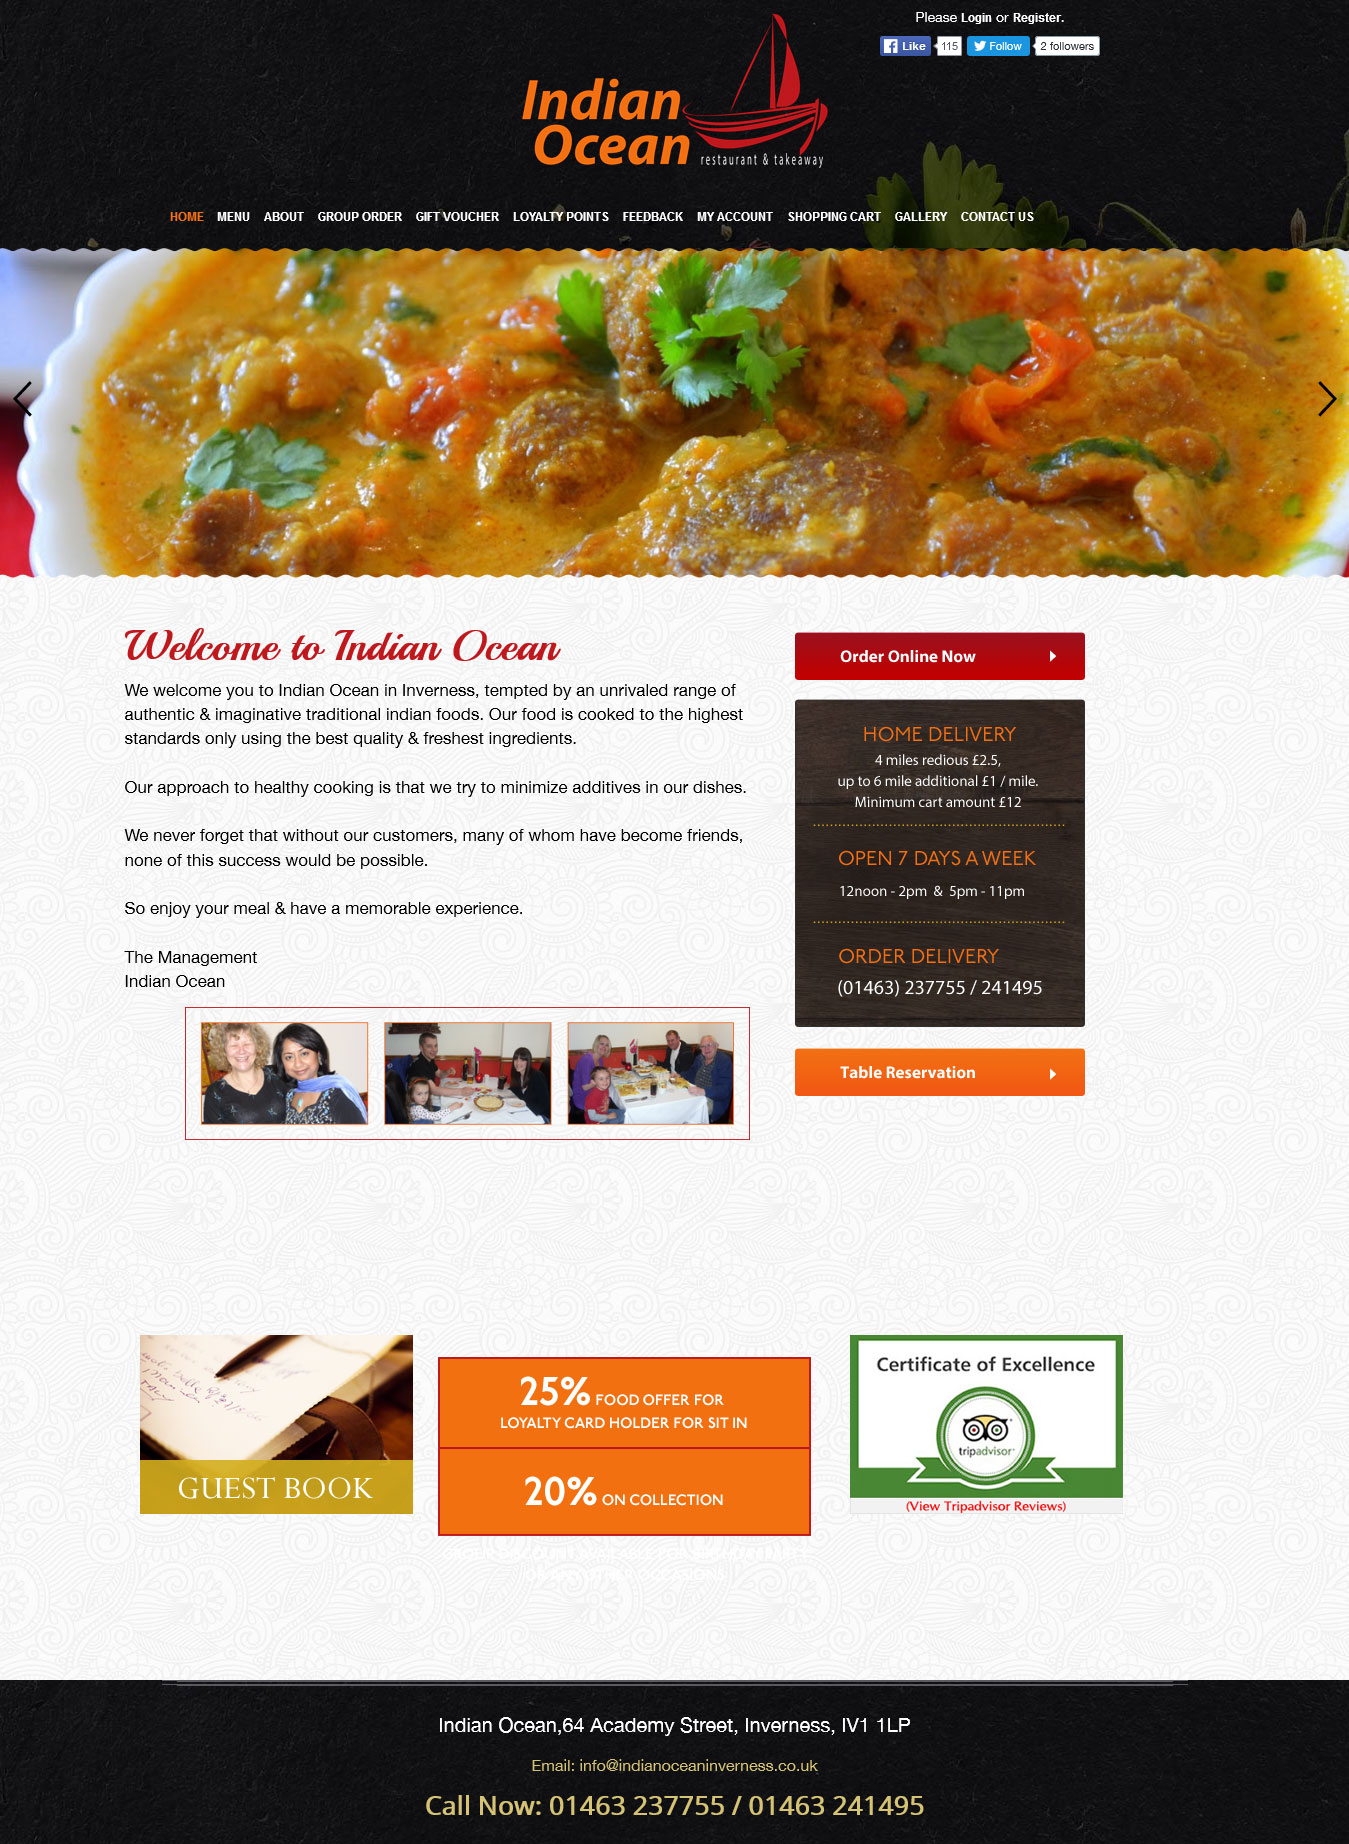 Takeaway Restaurant Online Ordering System Epos